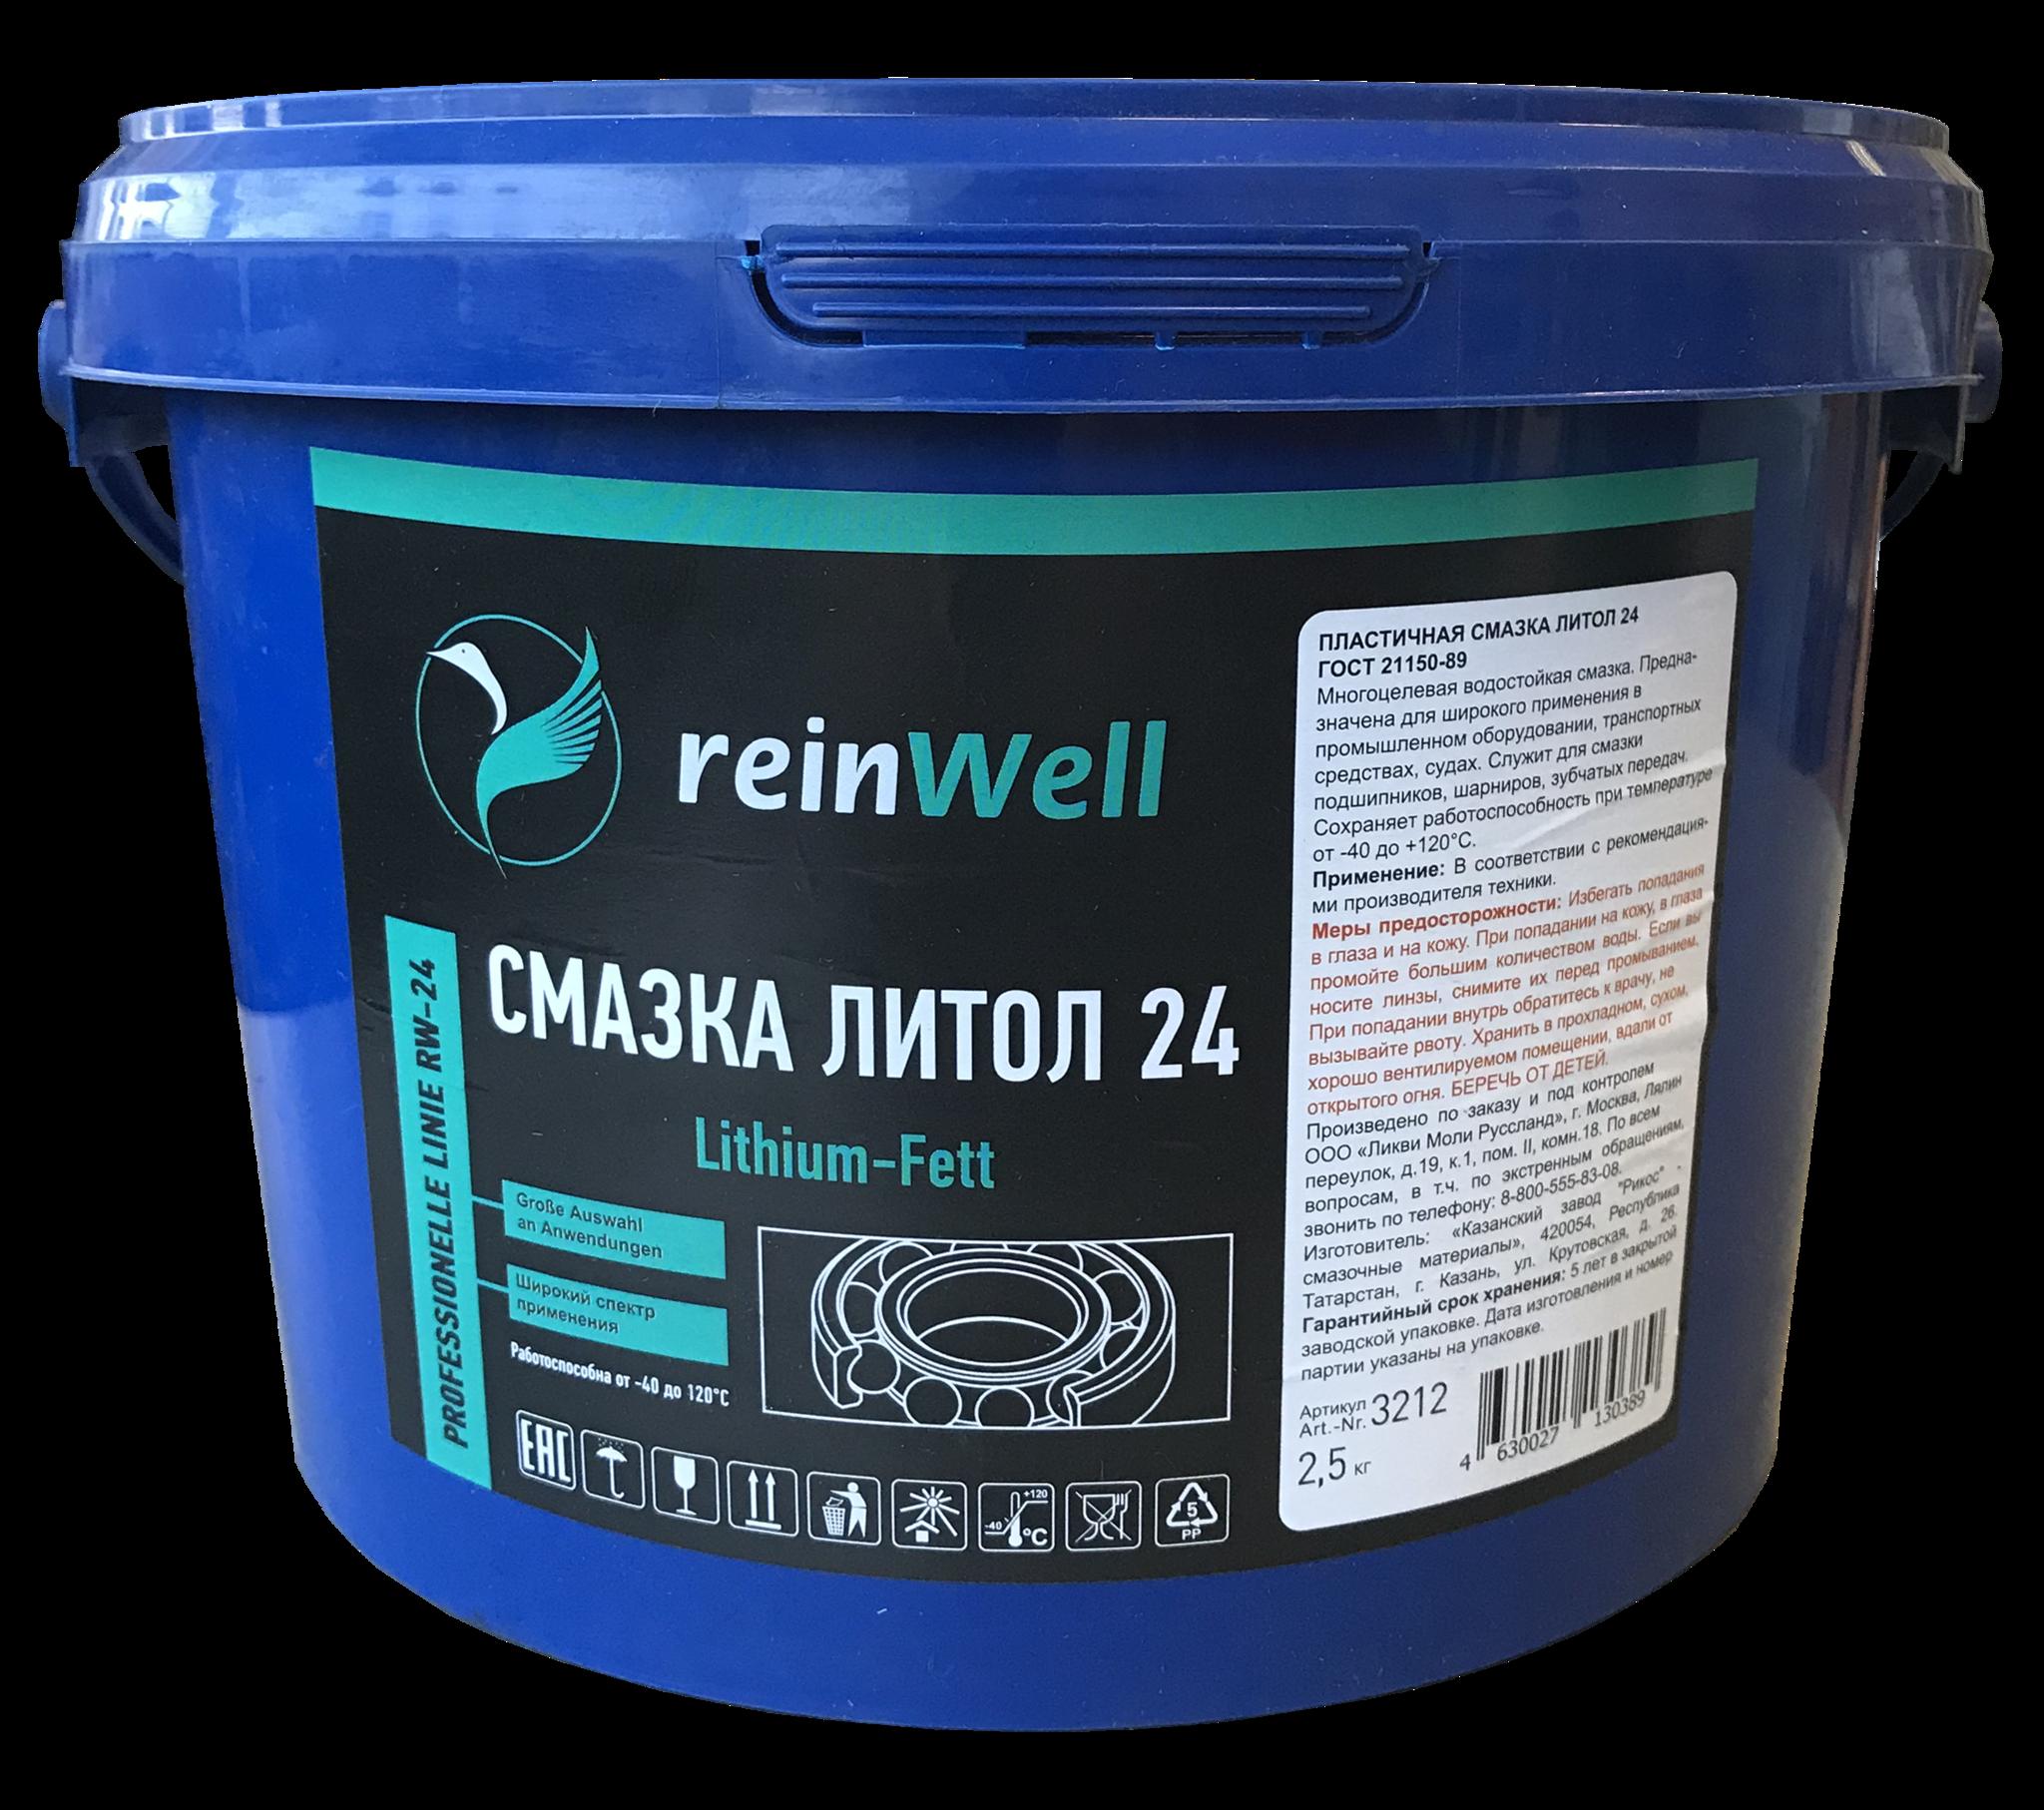 ReinWell Смазка пластичная Литол RW-24